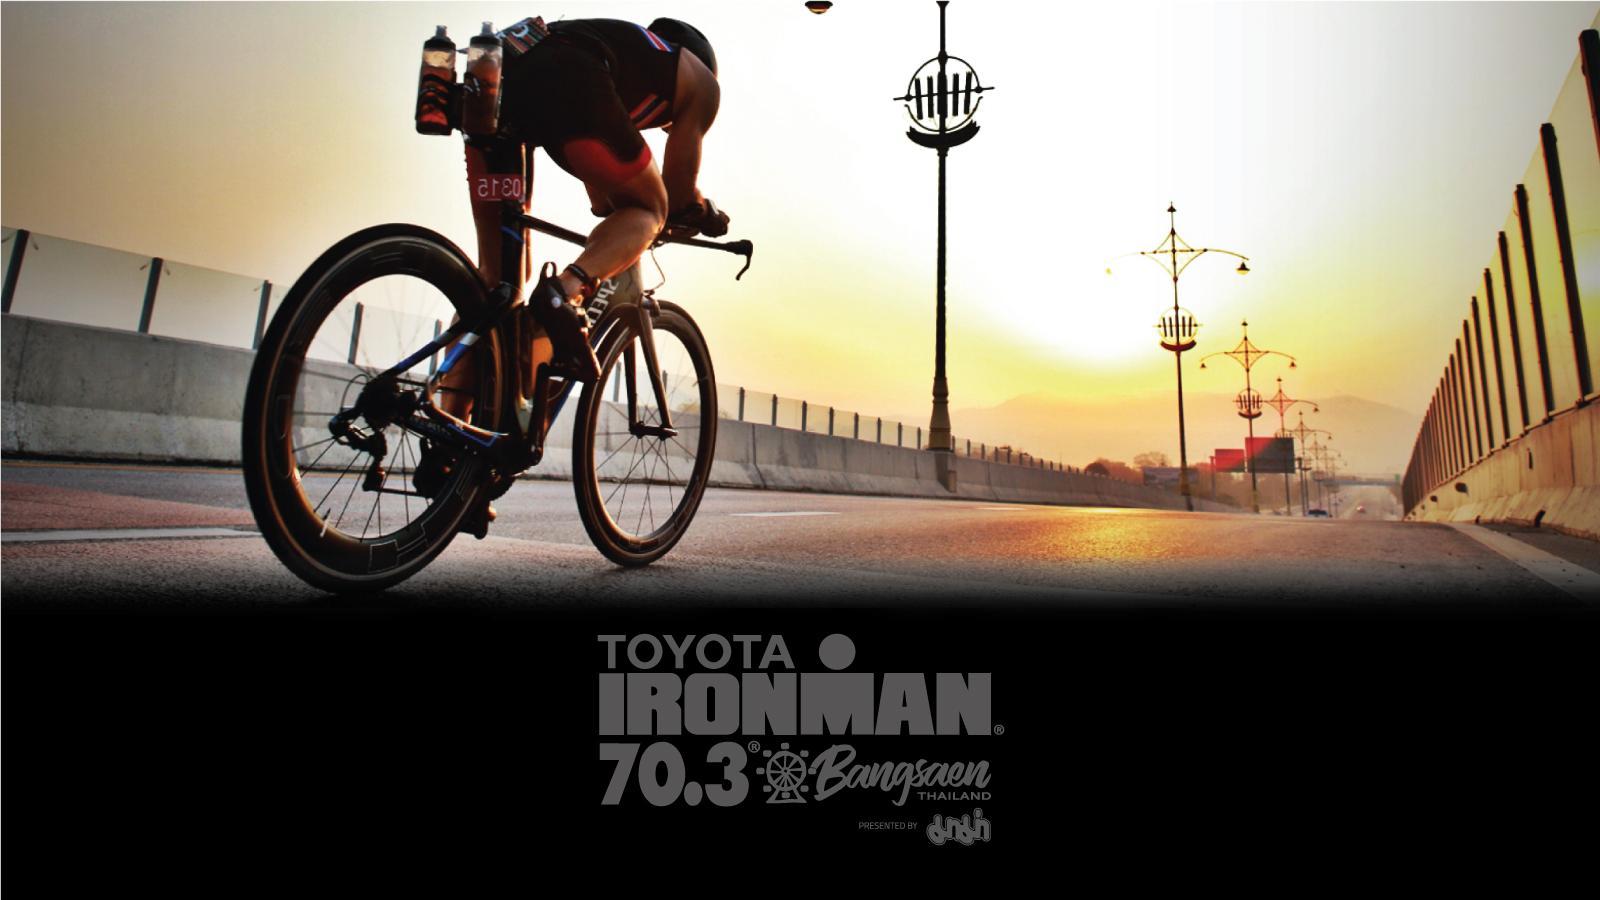 IM703Bangsaen-Web-Banner-1600x900-Pic_03.jpg